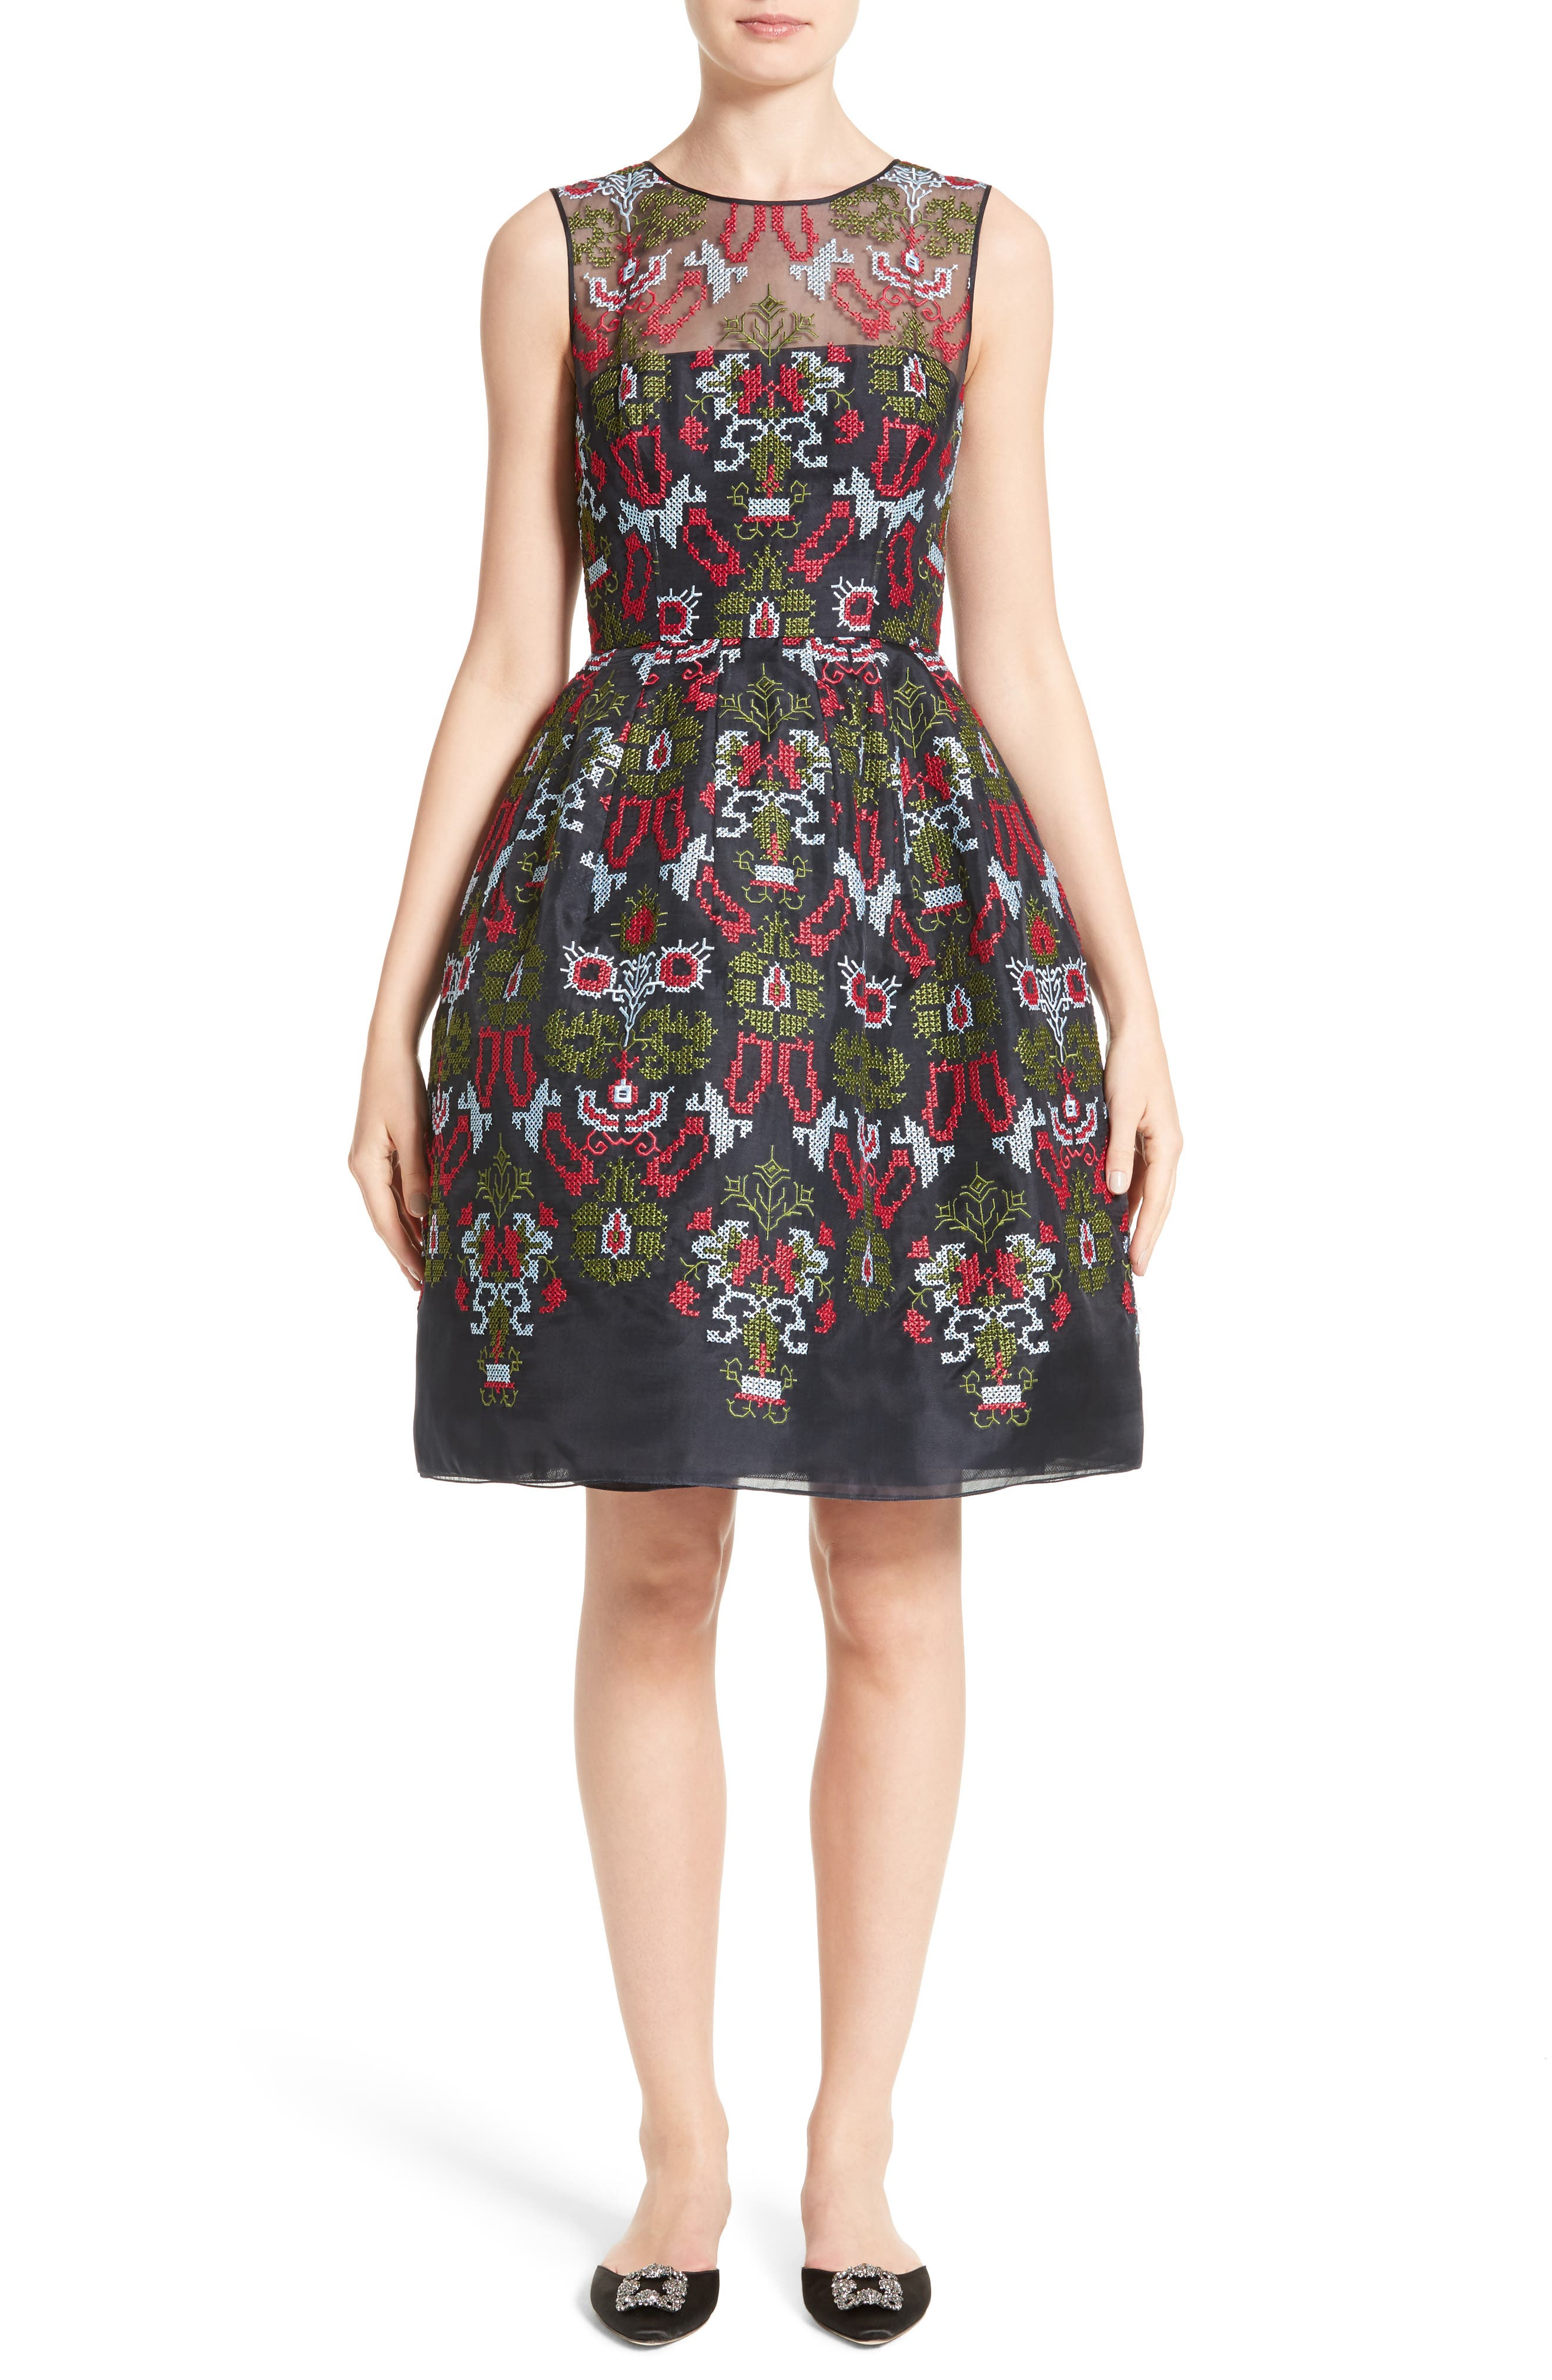 Alternate Image 1 Selected - Oscar de la Renta Needlepoint Fit & Flare Dress